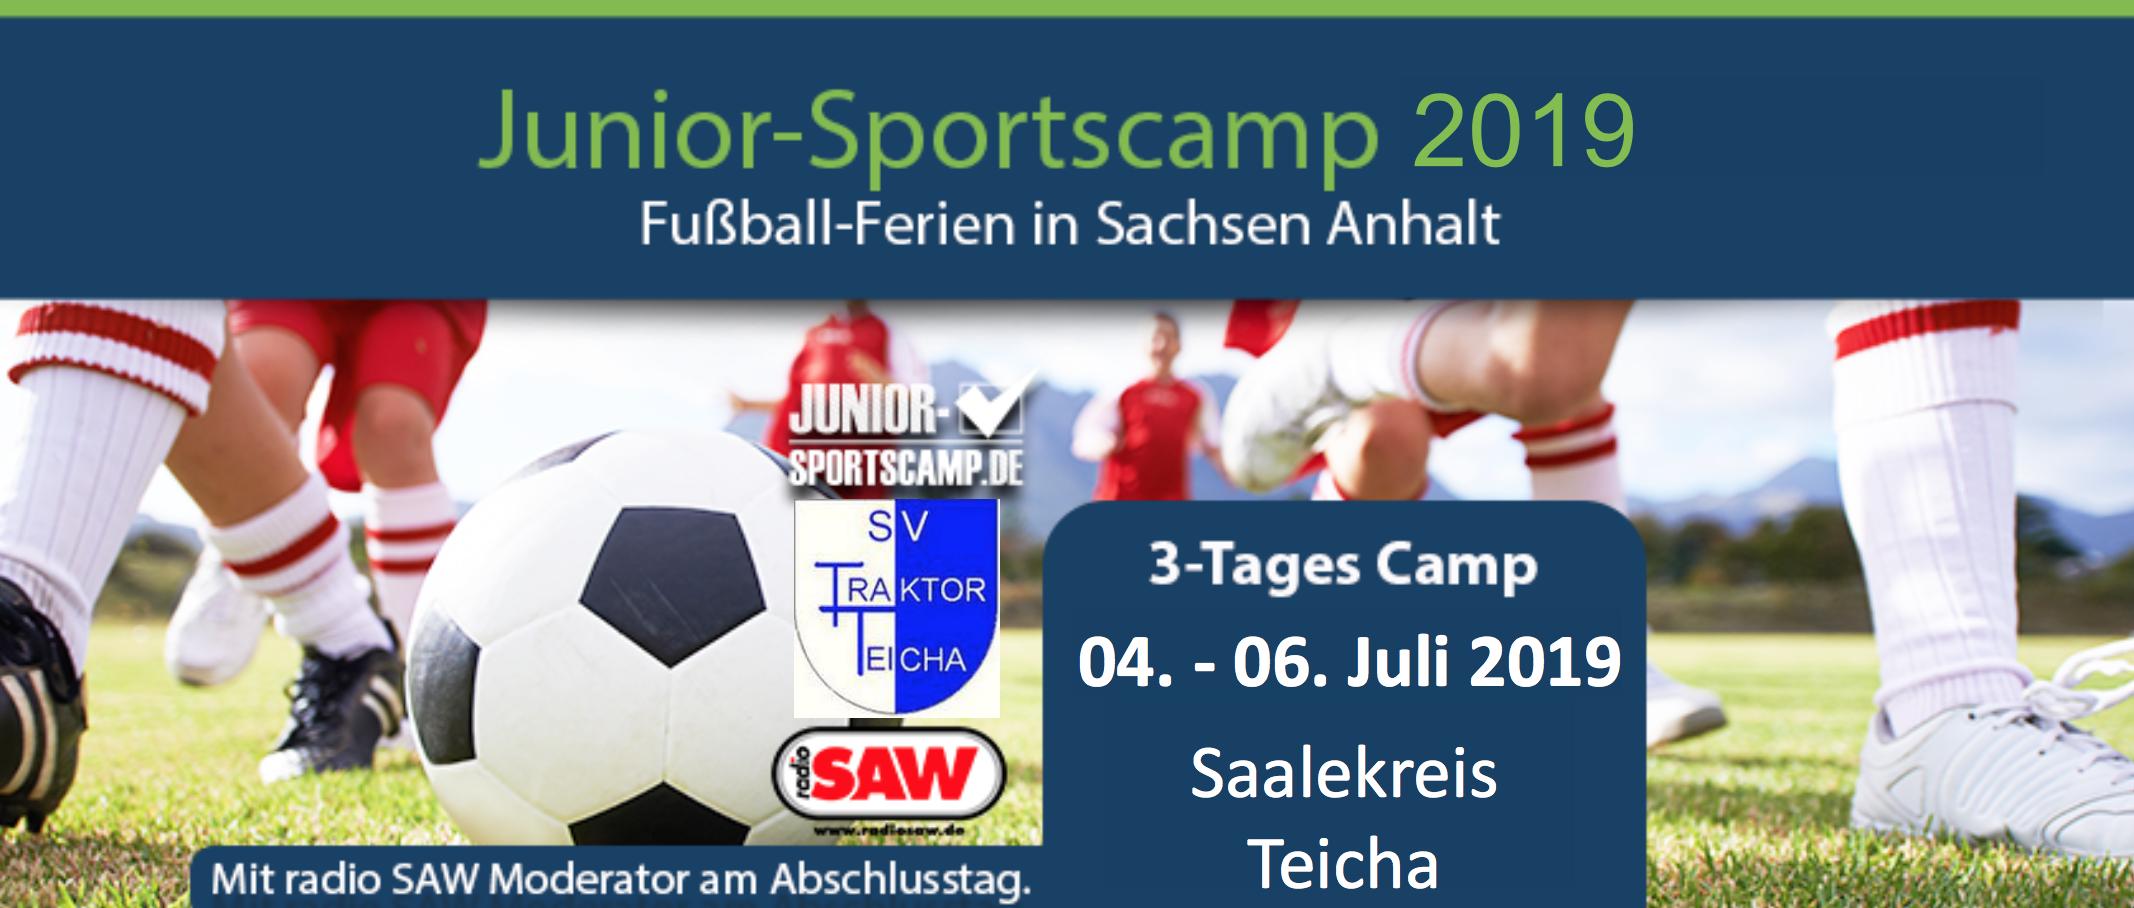 Camp_Teicha_04.-06.07.2019_SAW